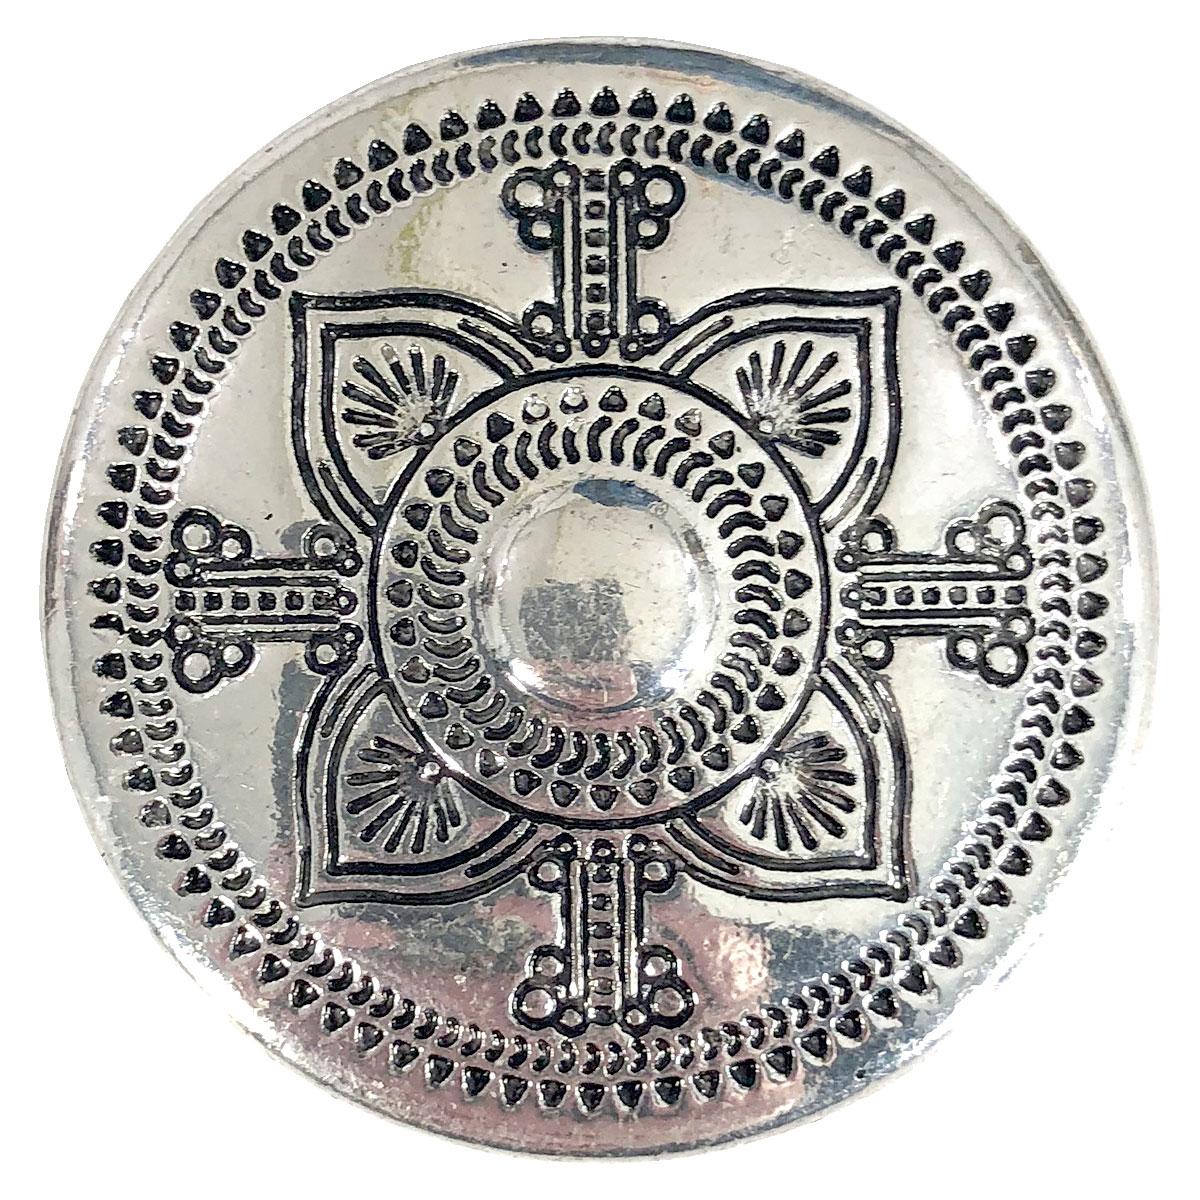 Magnetic Brooches - Artful Design - Plain Back